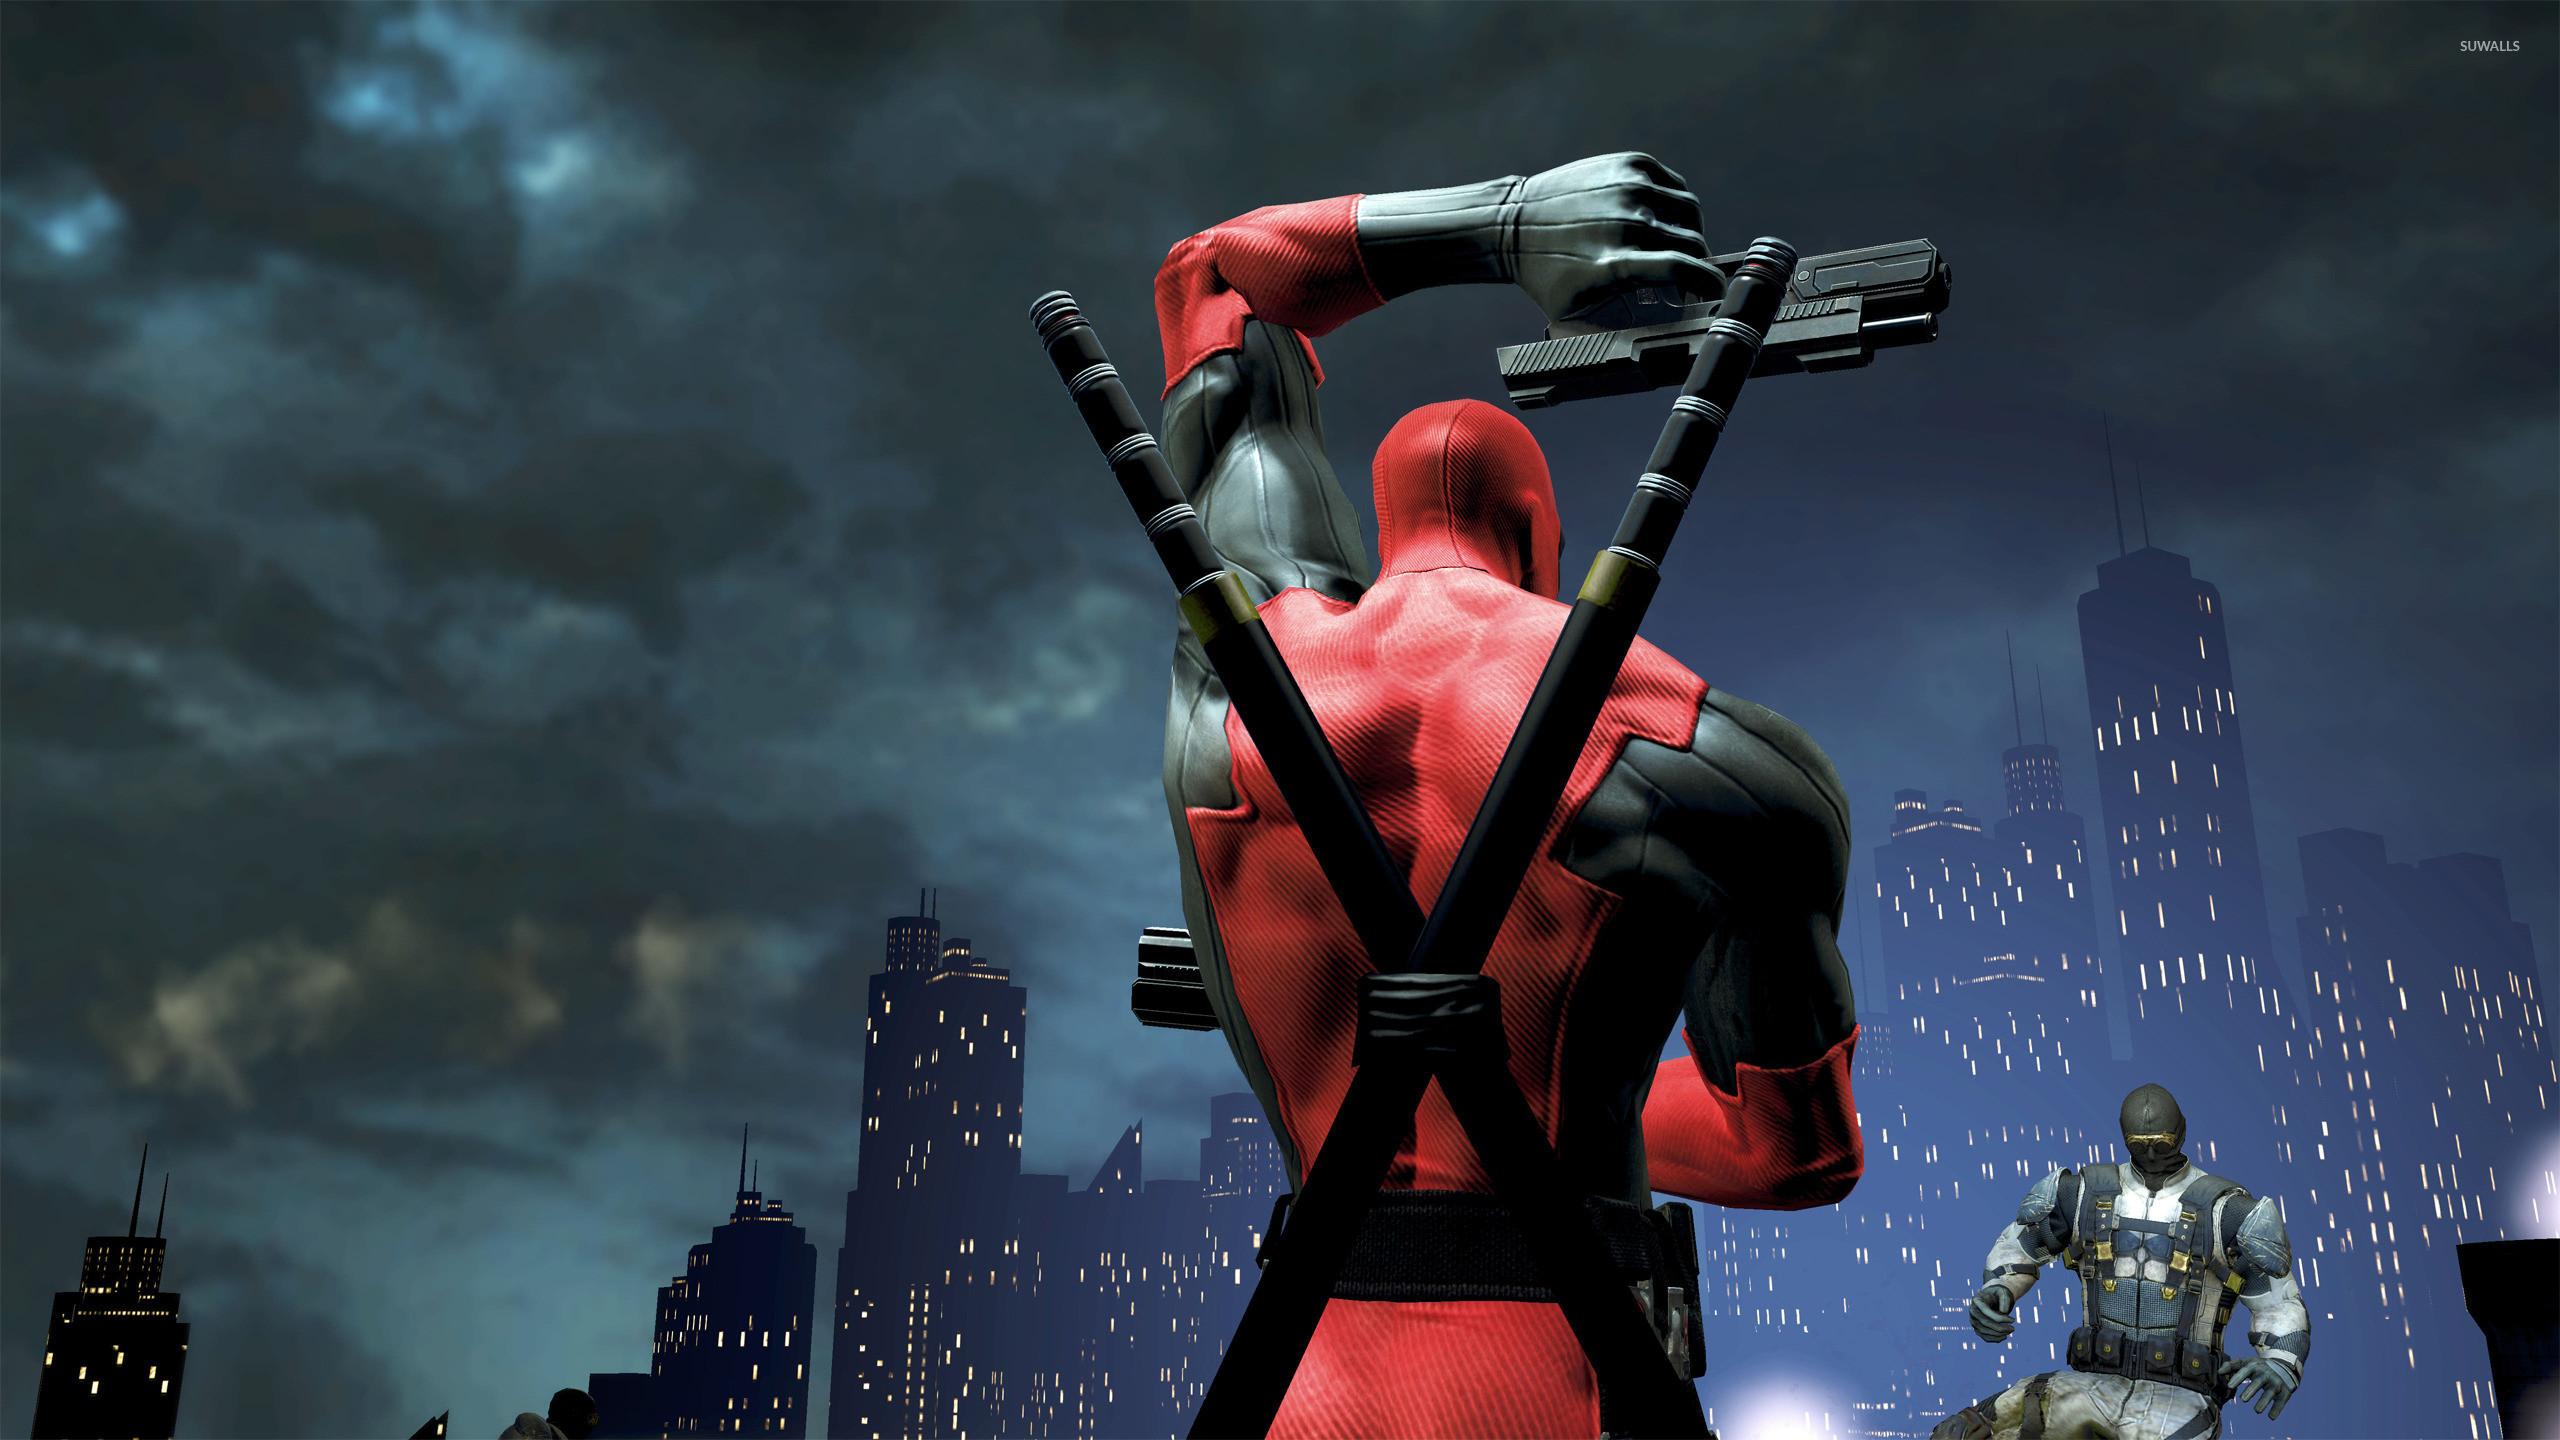 4K Deadpool Wallpaper (56+ images)